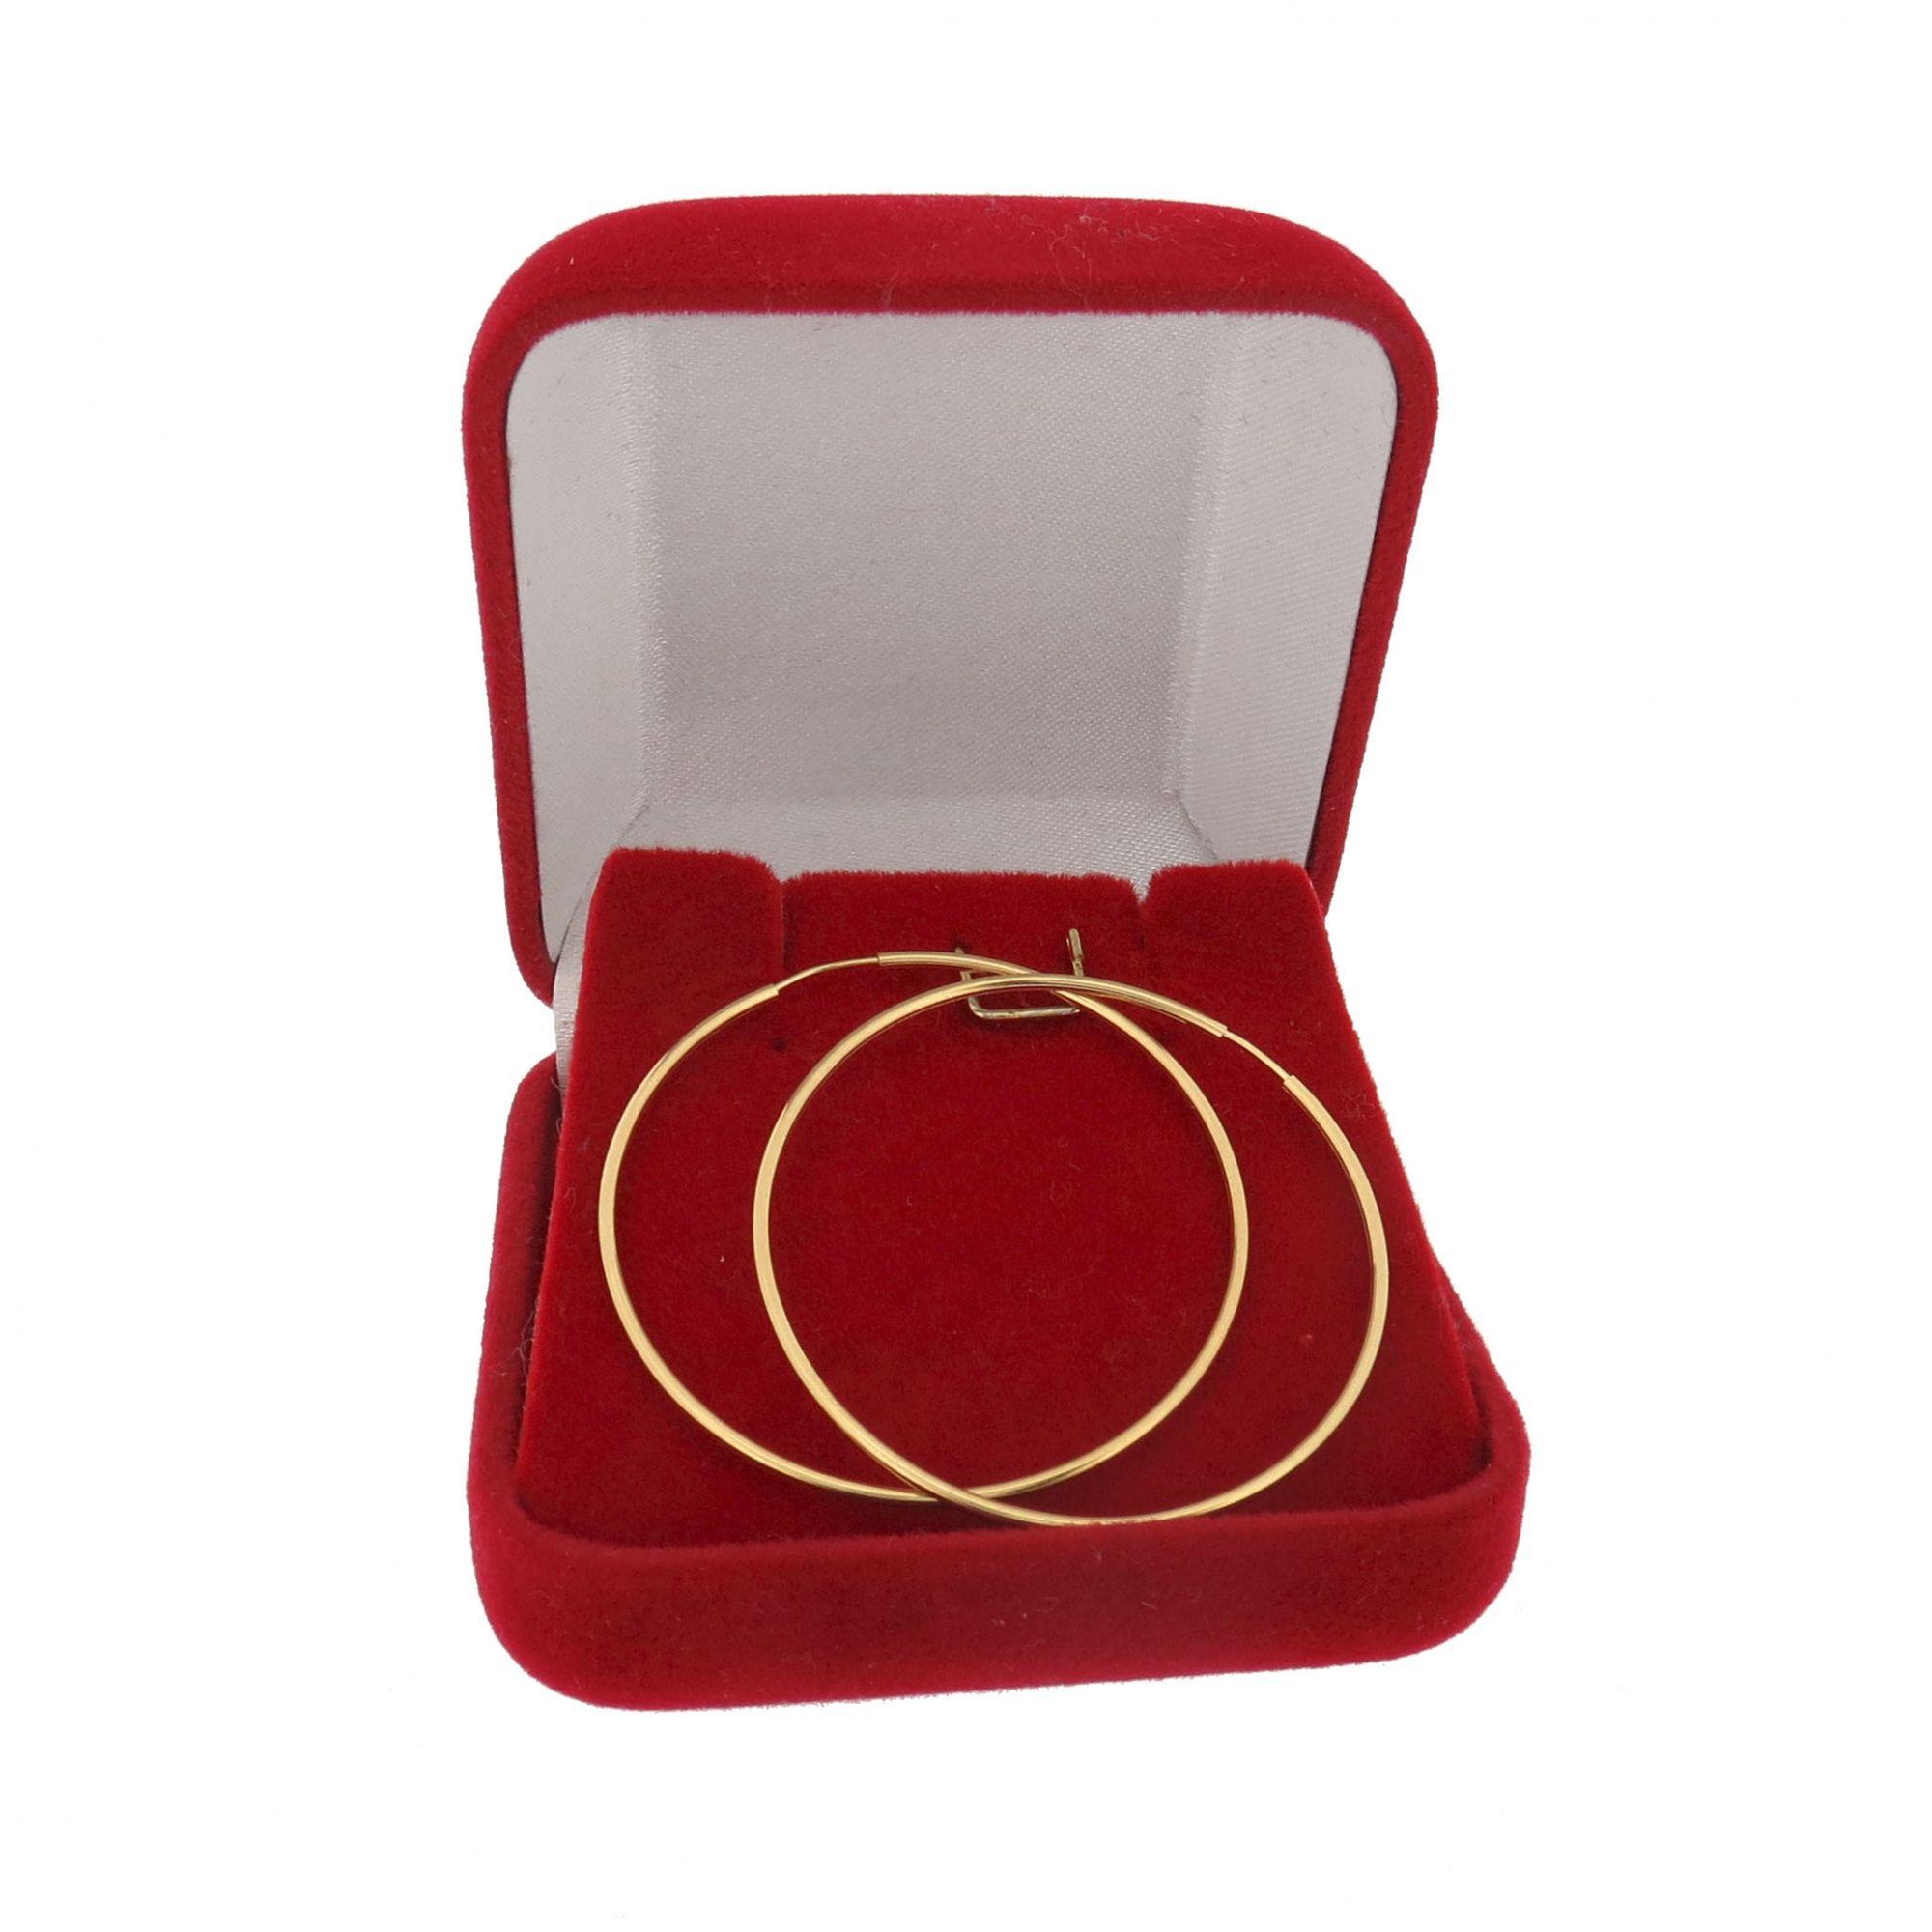 Brinco Argola redonda 3,4cm Ouro 18k